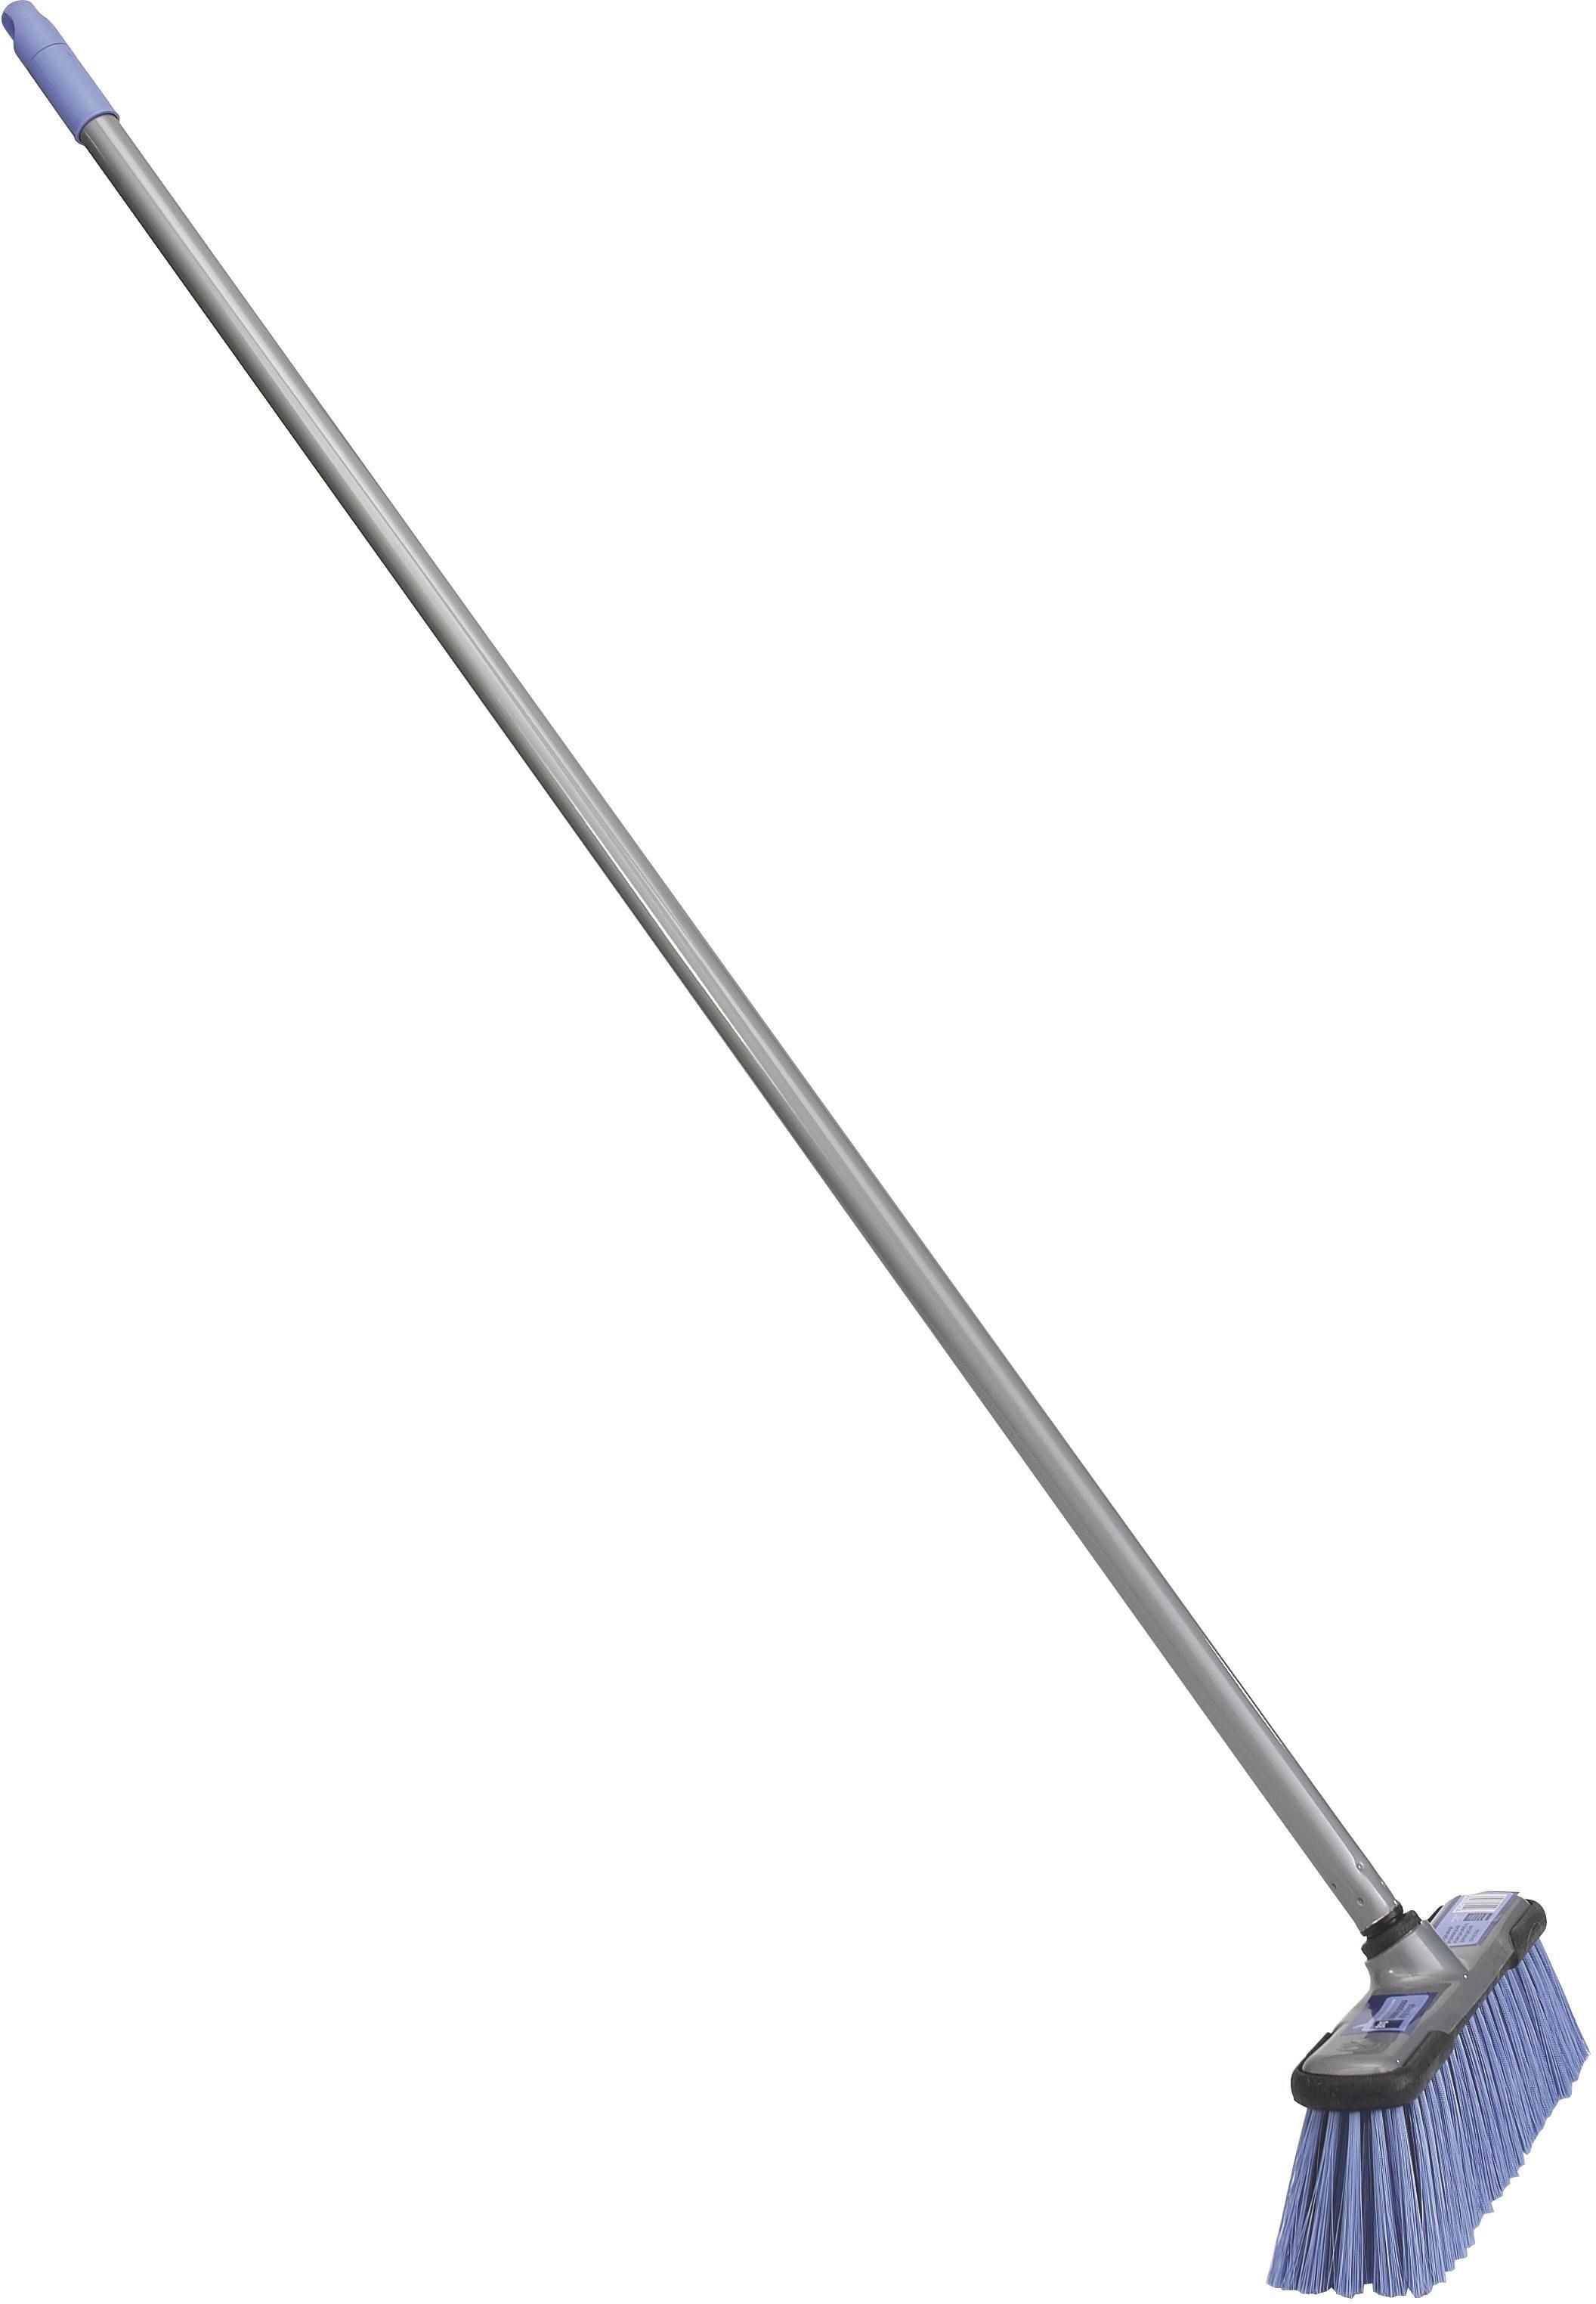 B Amp Q Soft Indoor Broom Departments Diy At B Amp Q